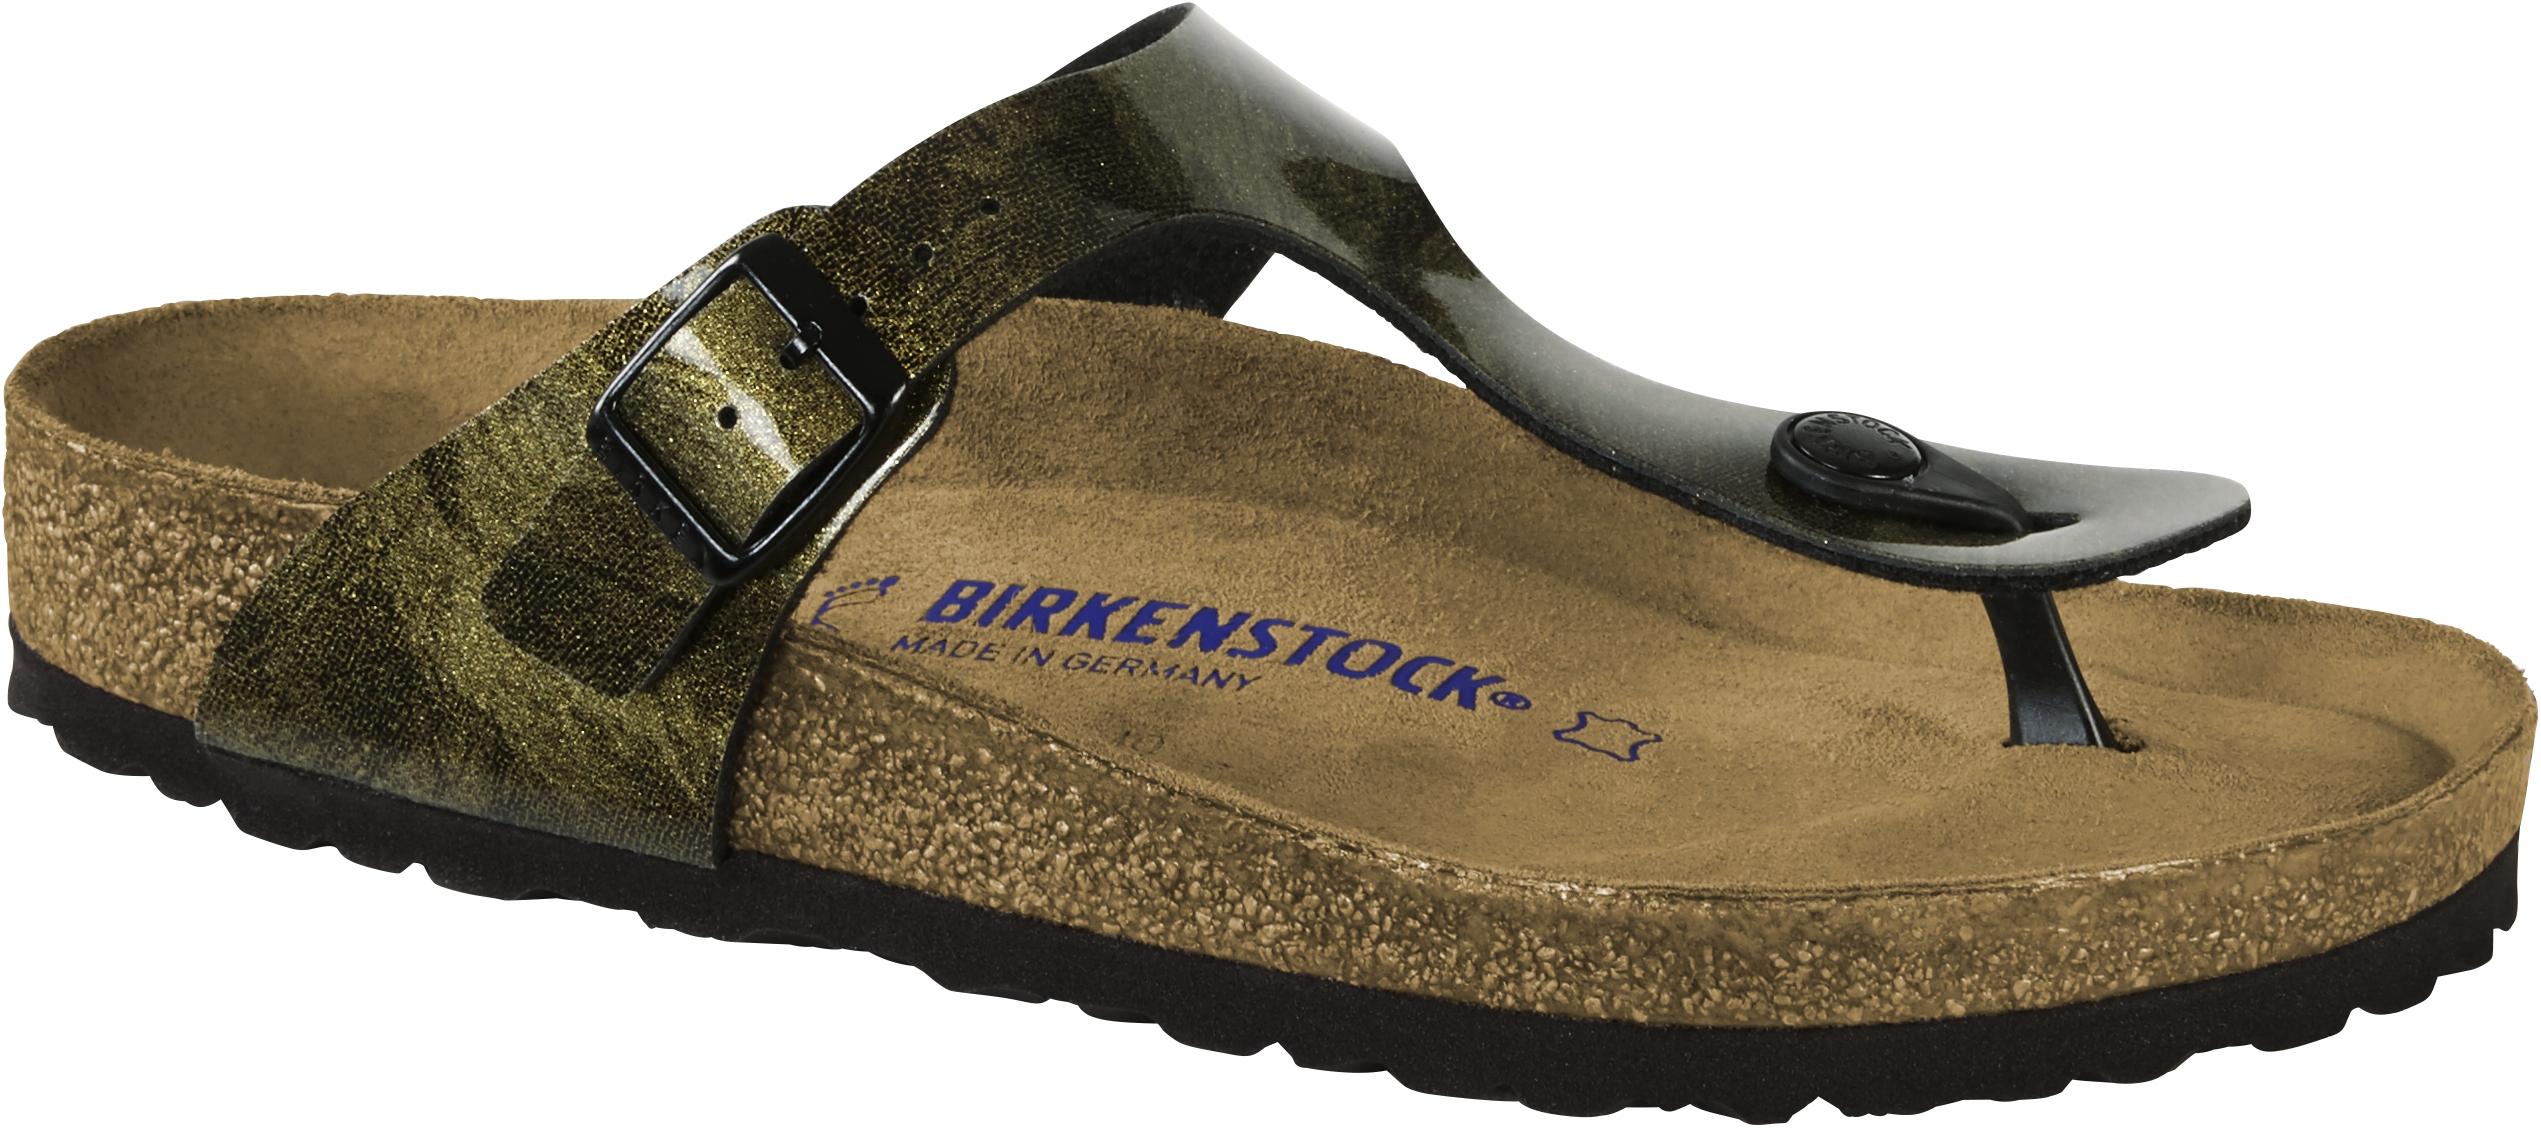 Birkenstock Zehensteg Sandale Gizeh BF iride strong gold Gr. 35 43 1011156